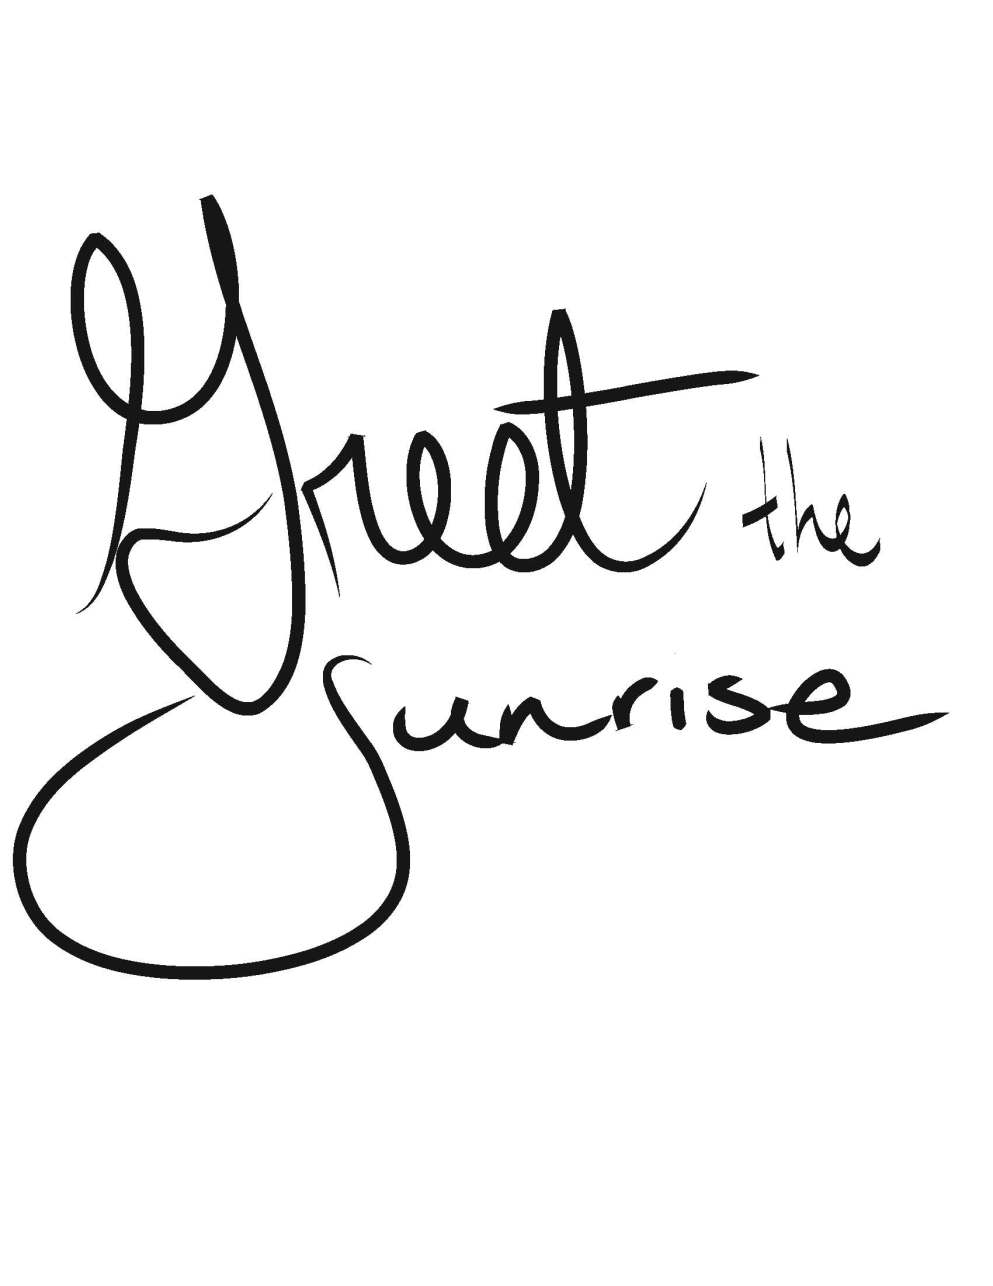 5-greet-the-sunrise